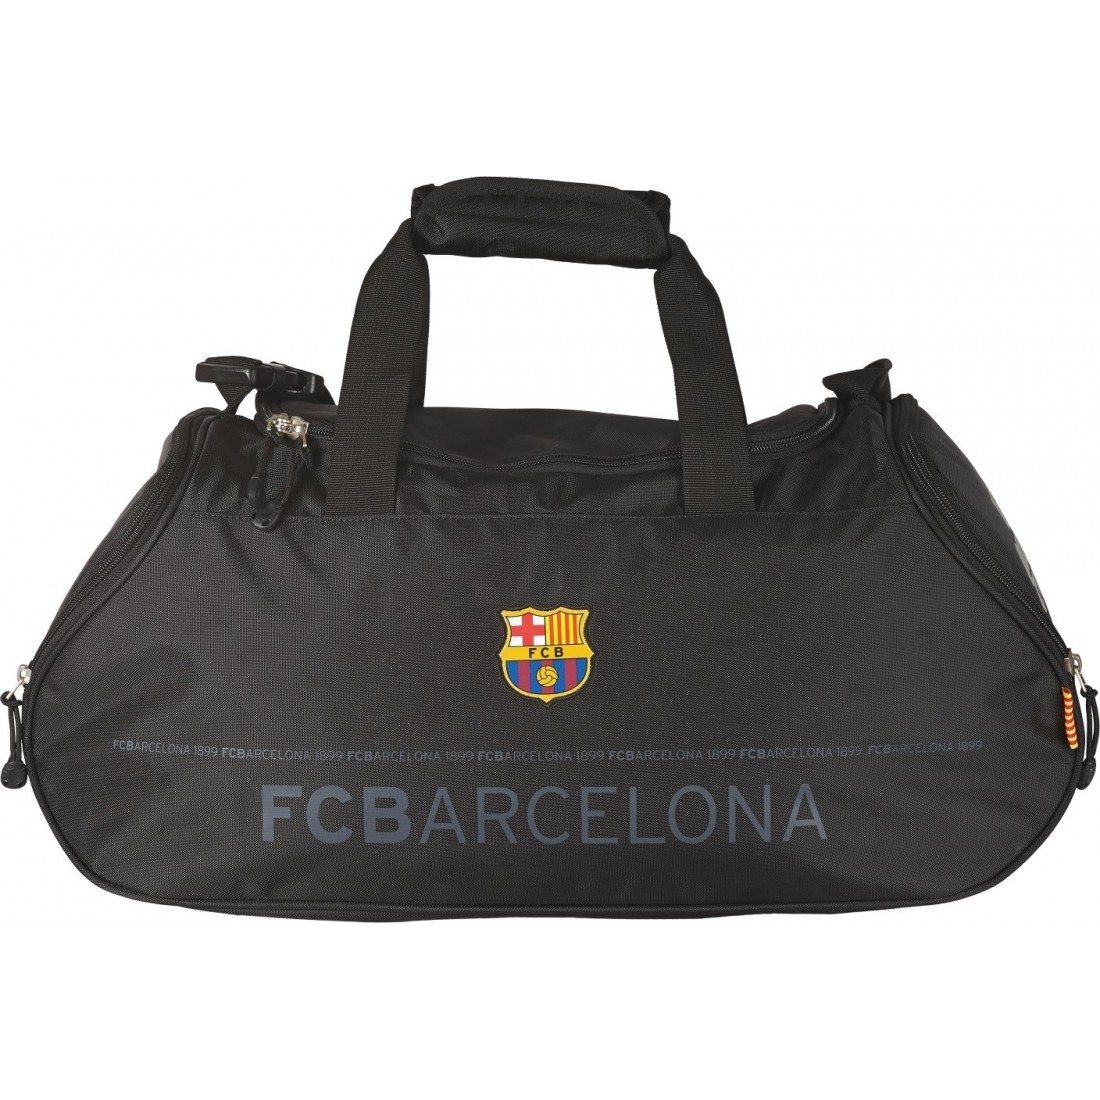 Torba Treningowa FC Barcelona - plecak-tornister.pl